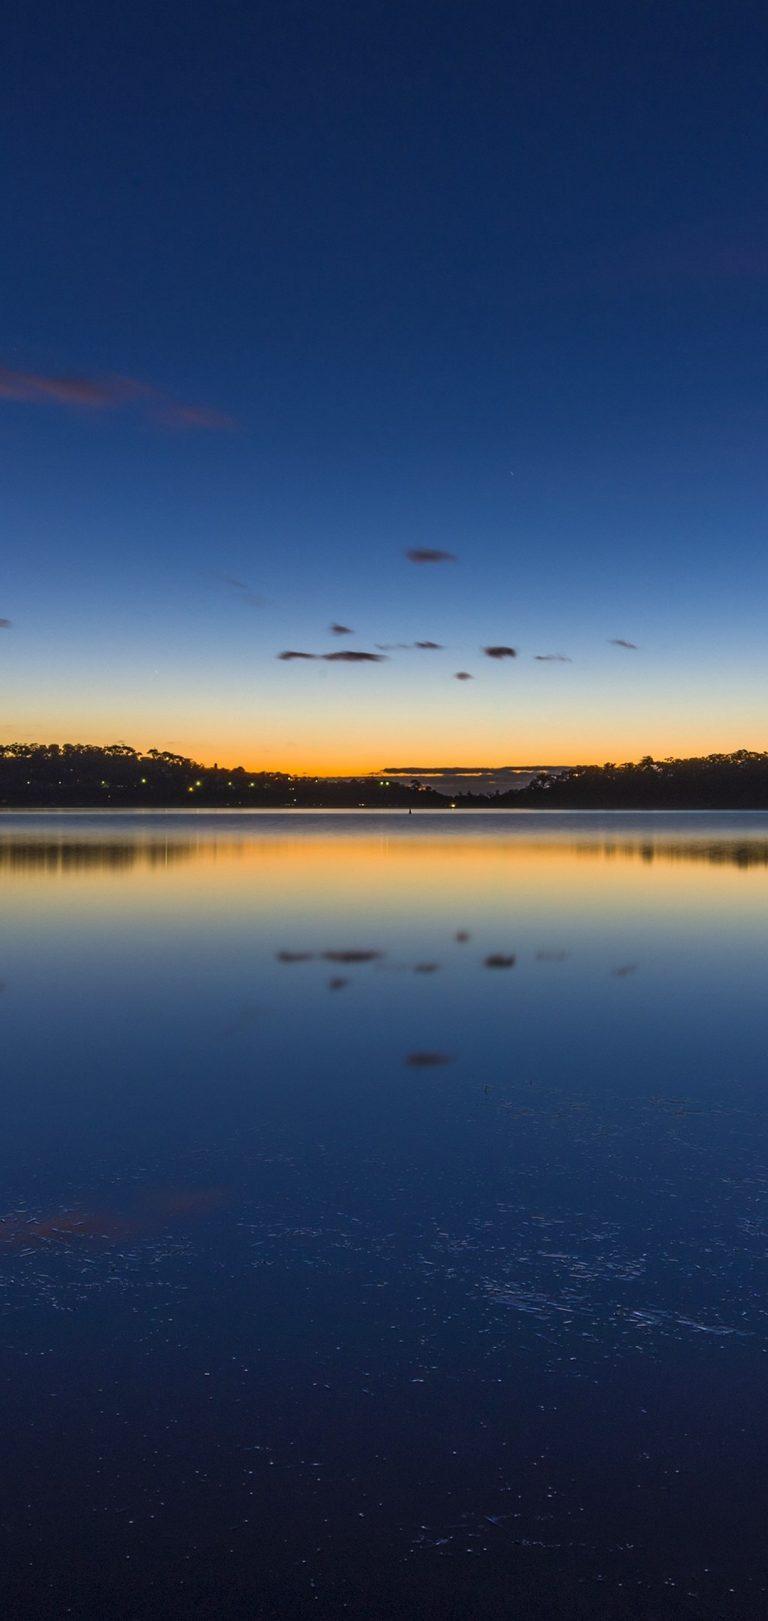 Nature Lake Sunset Landscape Wallpaper 1080x2280 768x1621